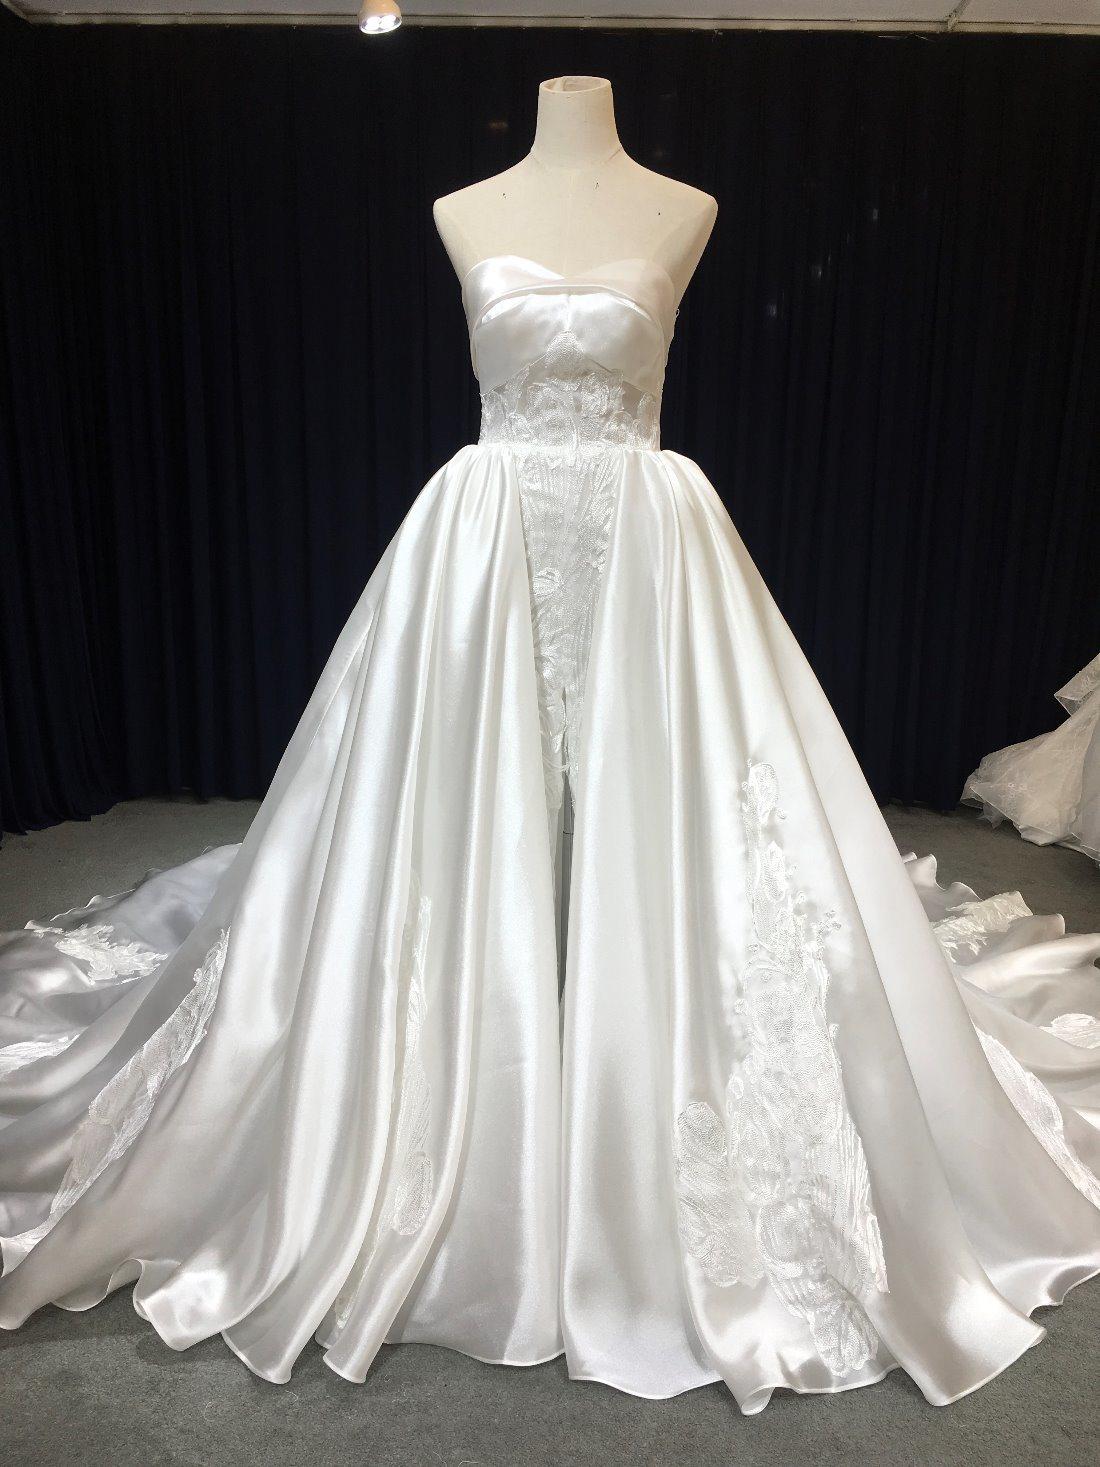 China Aoliweiya Custom Made Sketch 2 in 1 Wedding Dress - China ...